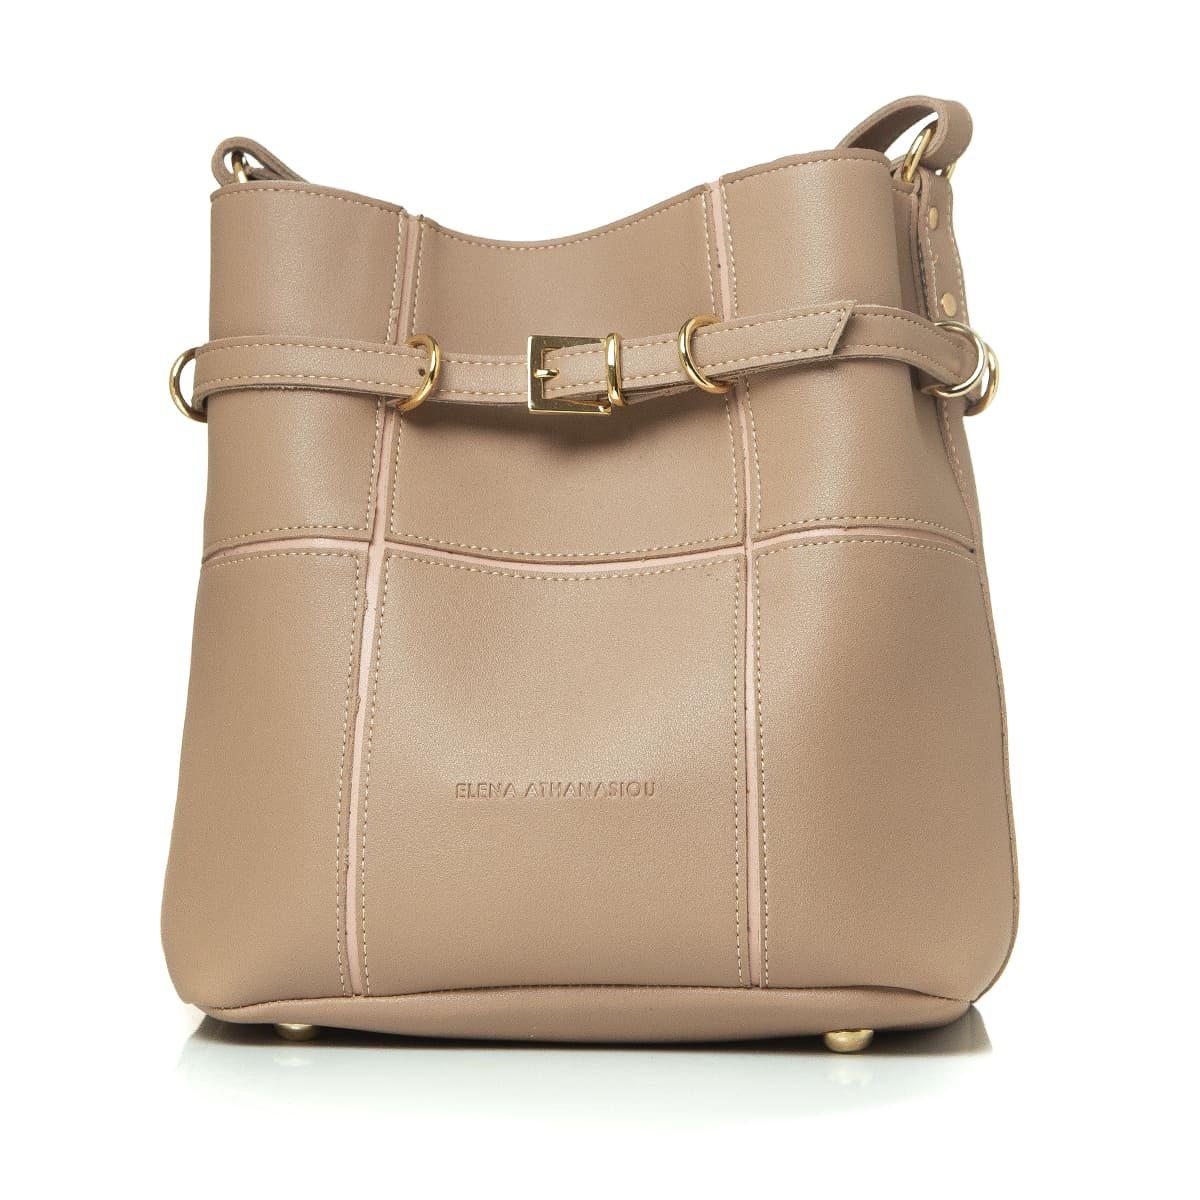 Elena Athanasiou Bags Puzzle Bag Havana L Size